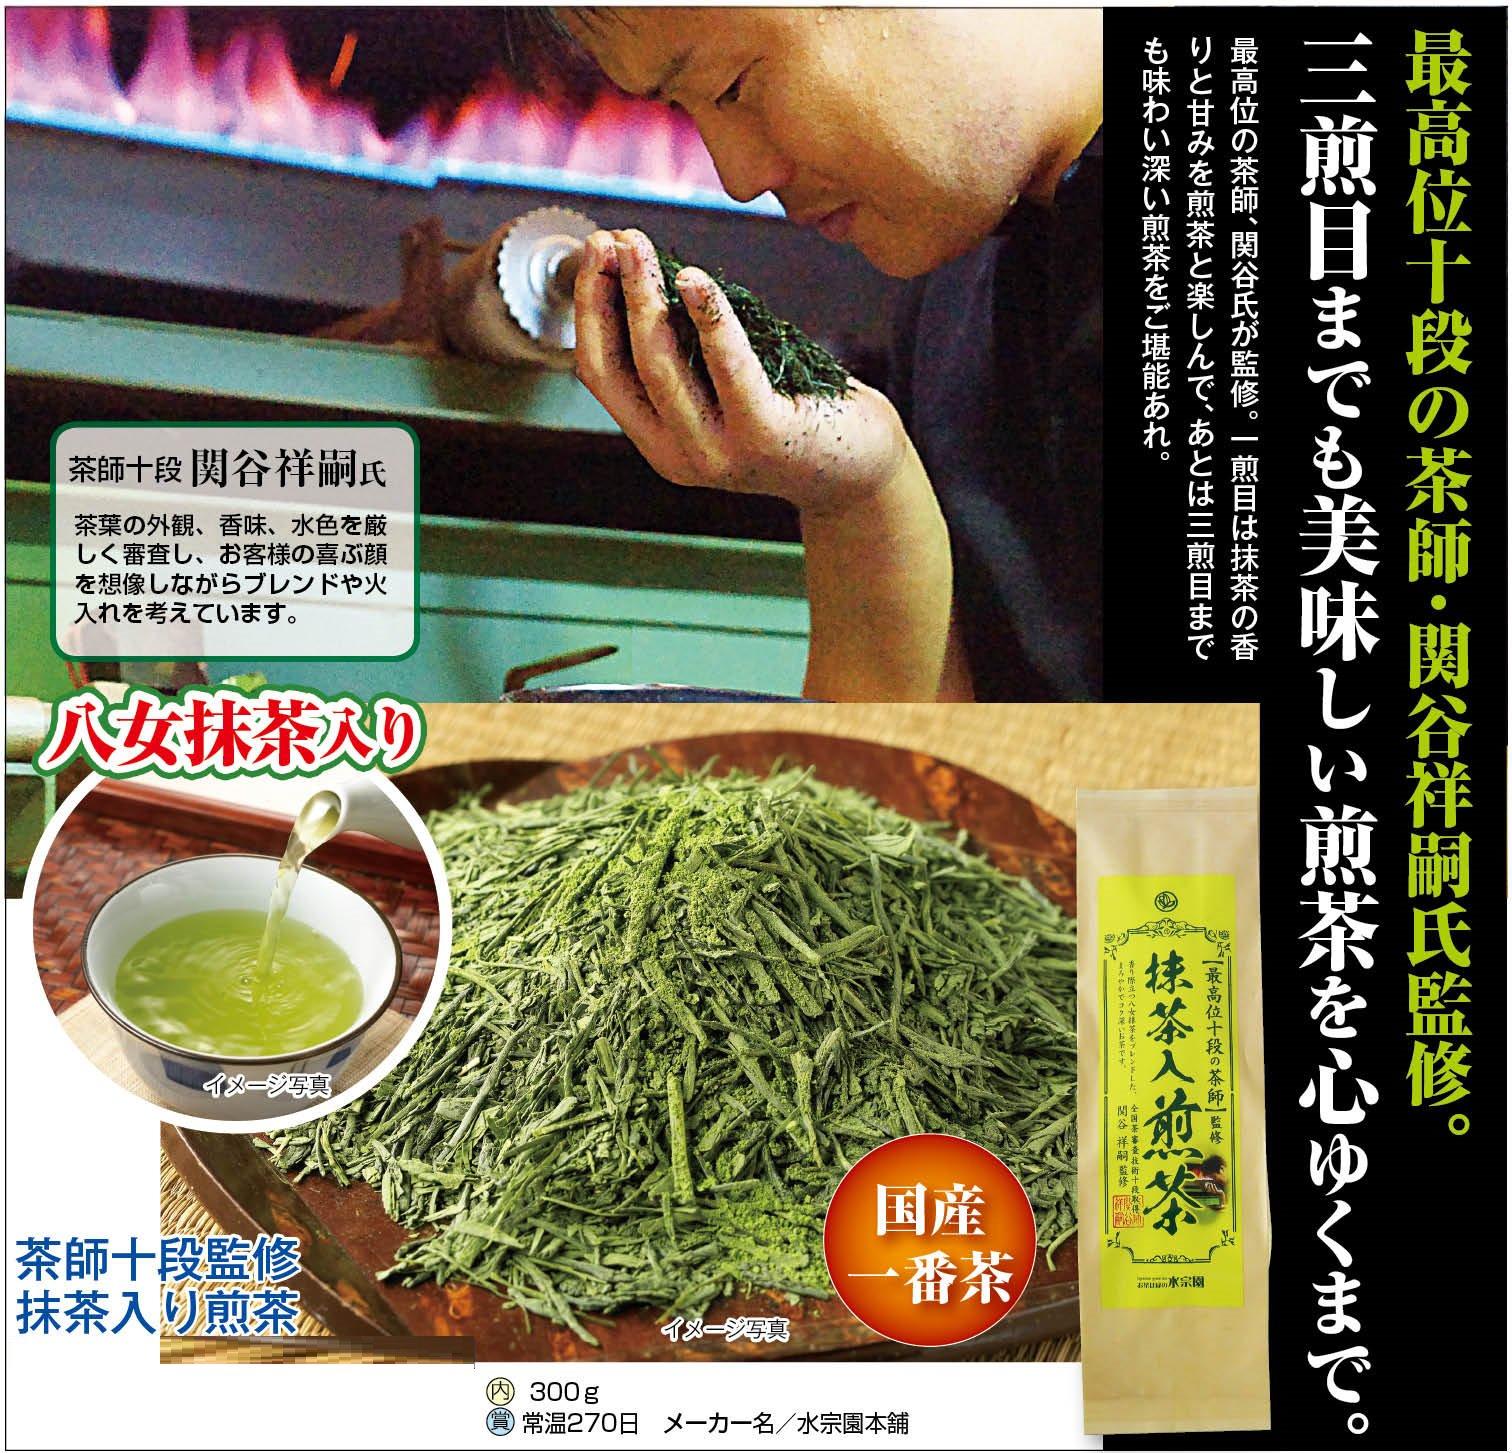 茶師十段監修 抹茶入り煎茶 300g